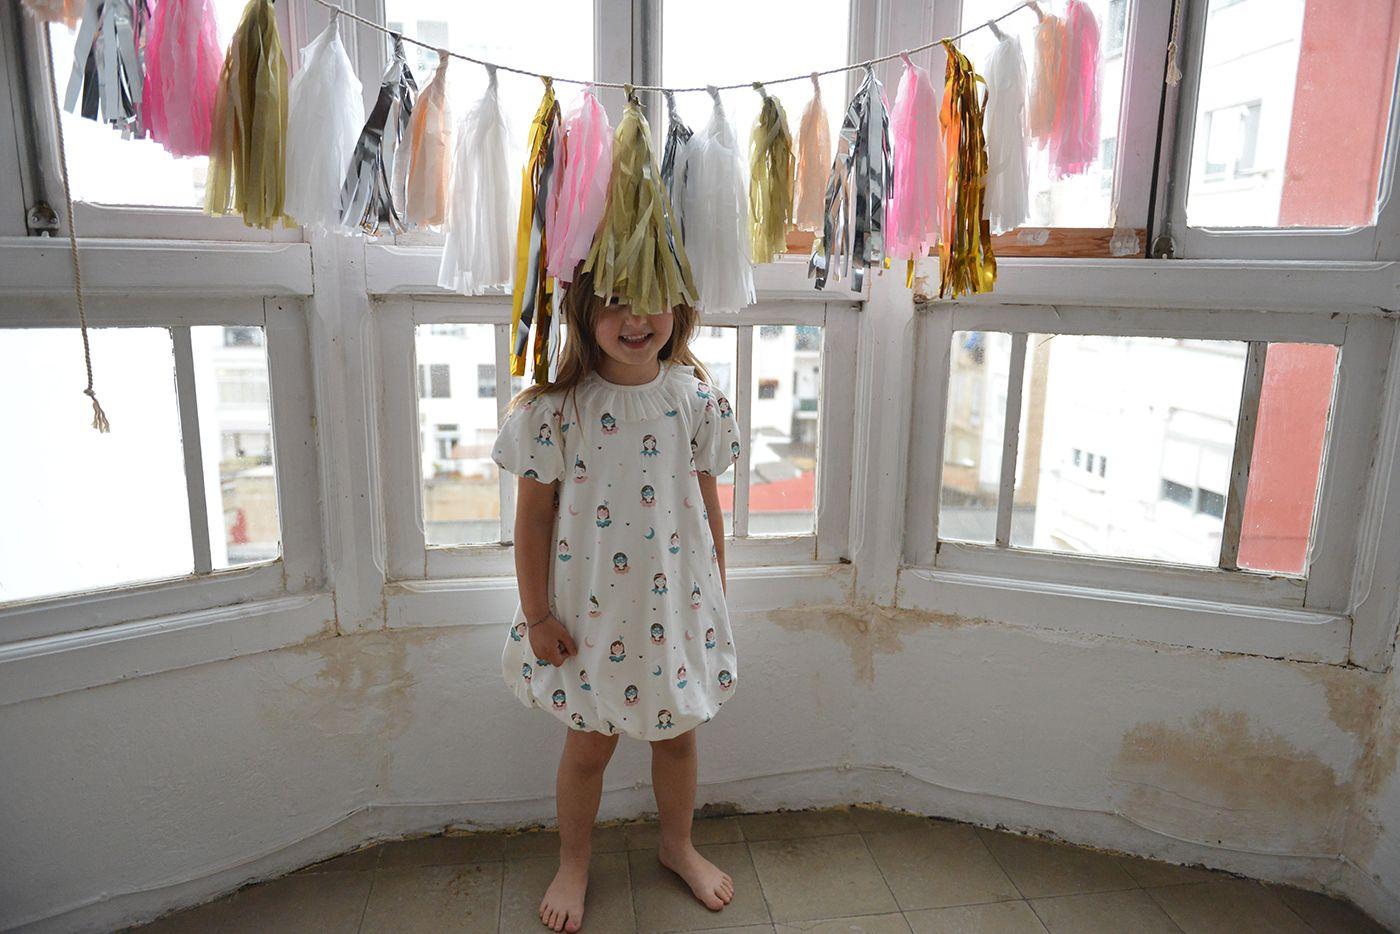 Camisola ou vestido?! Os 2! | Dress or PJ? Both! by Cookie #cookiedreams #pijamas